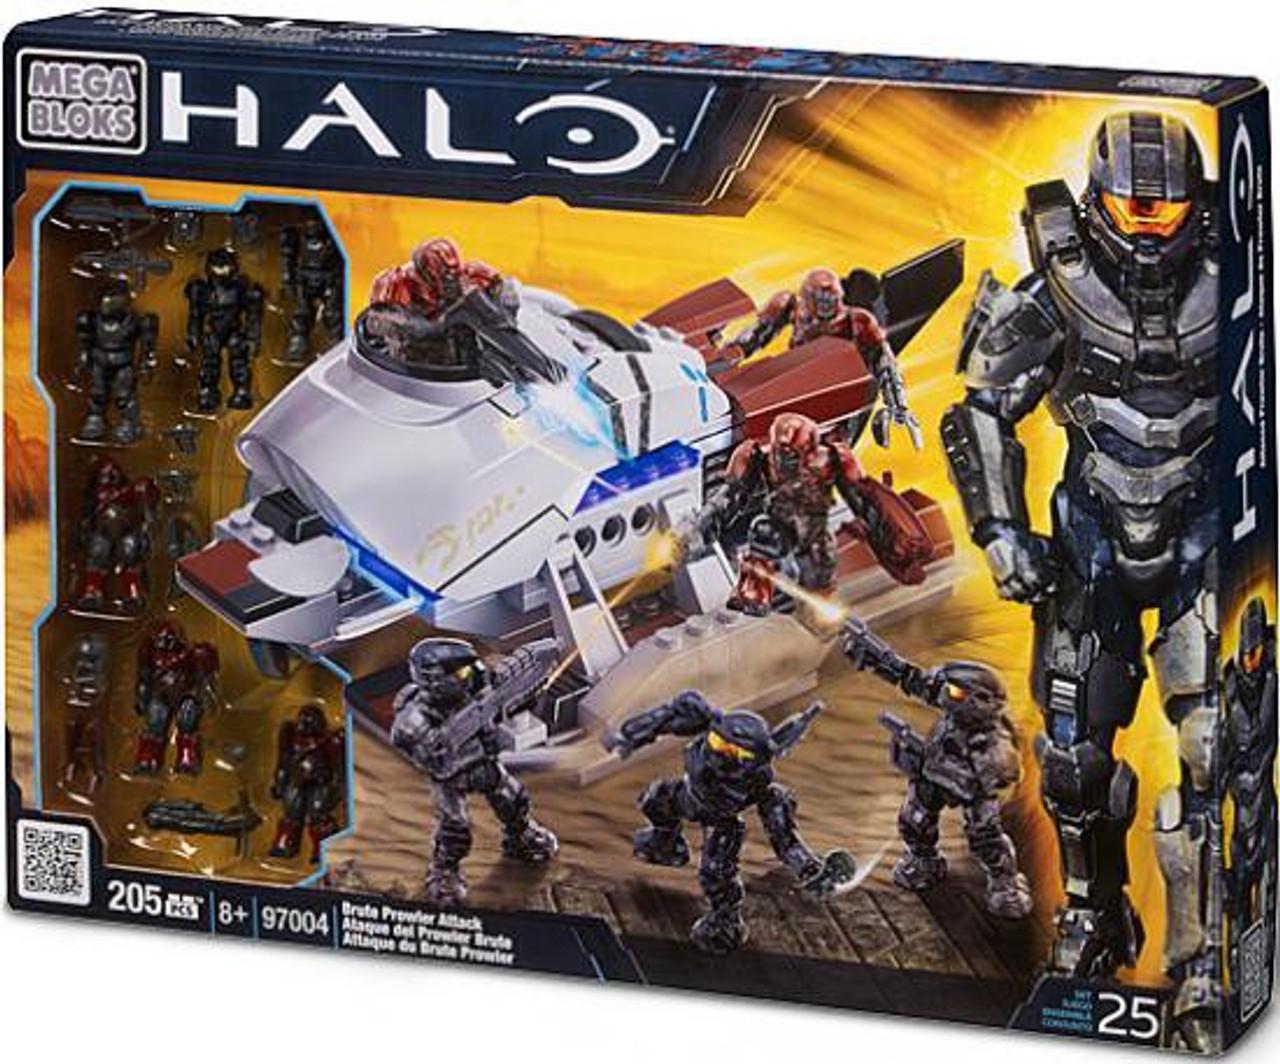 Mega Bloks Halo Brute Prowler Attack Exclusive Set #97004